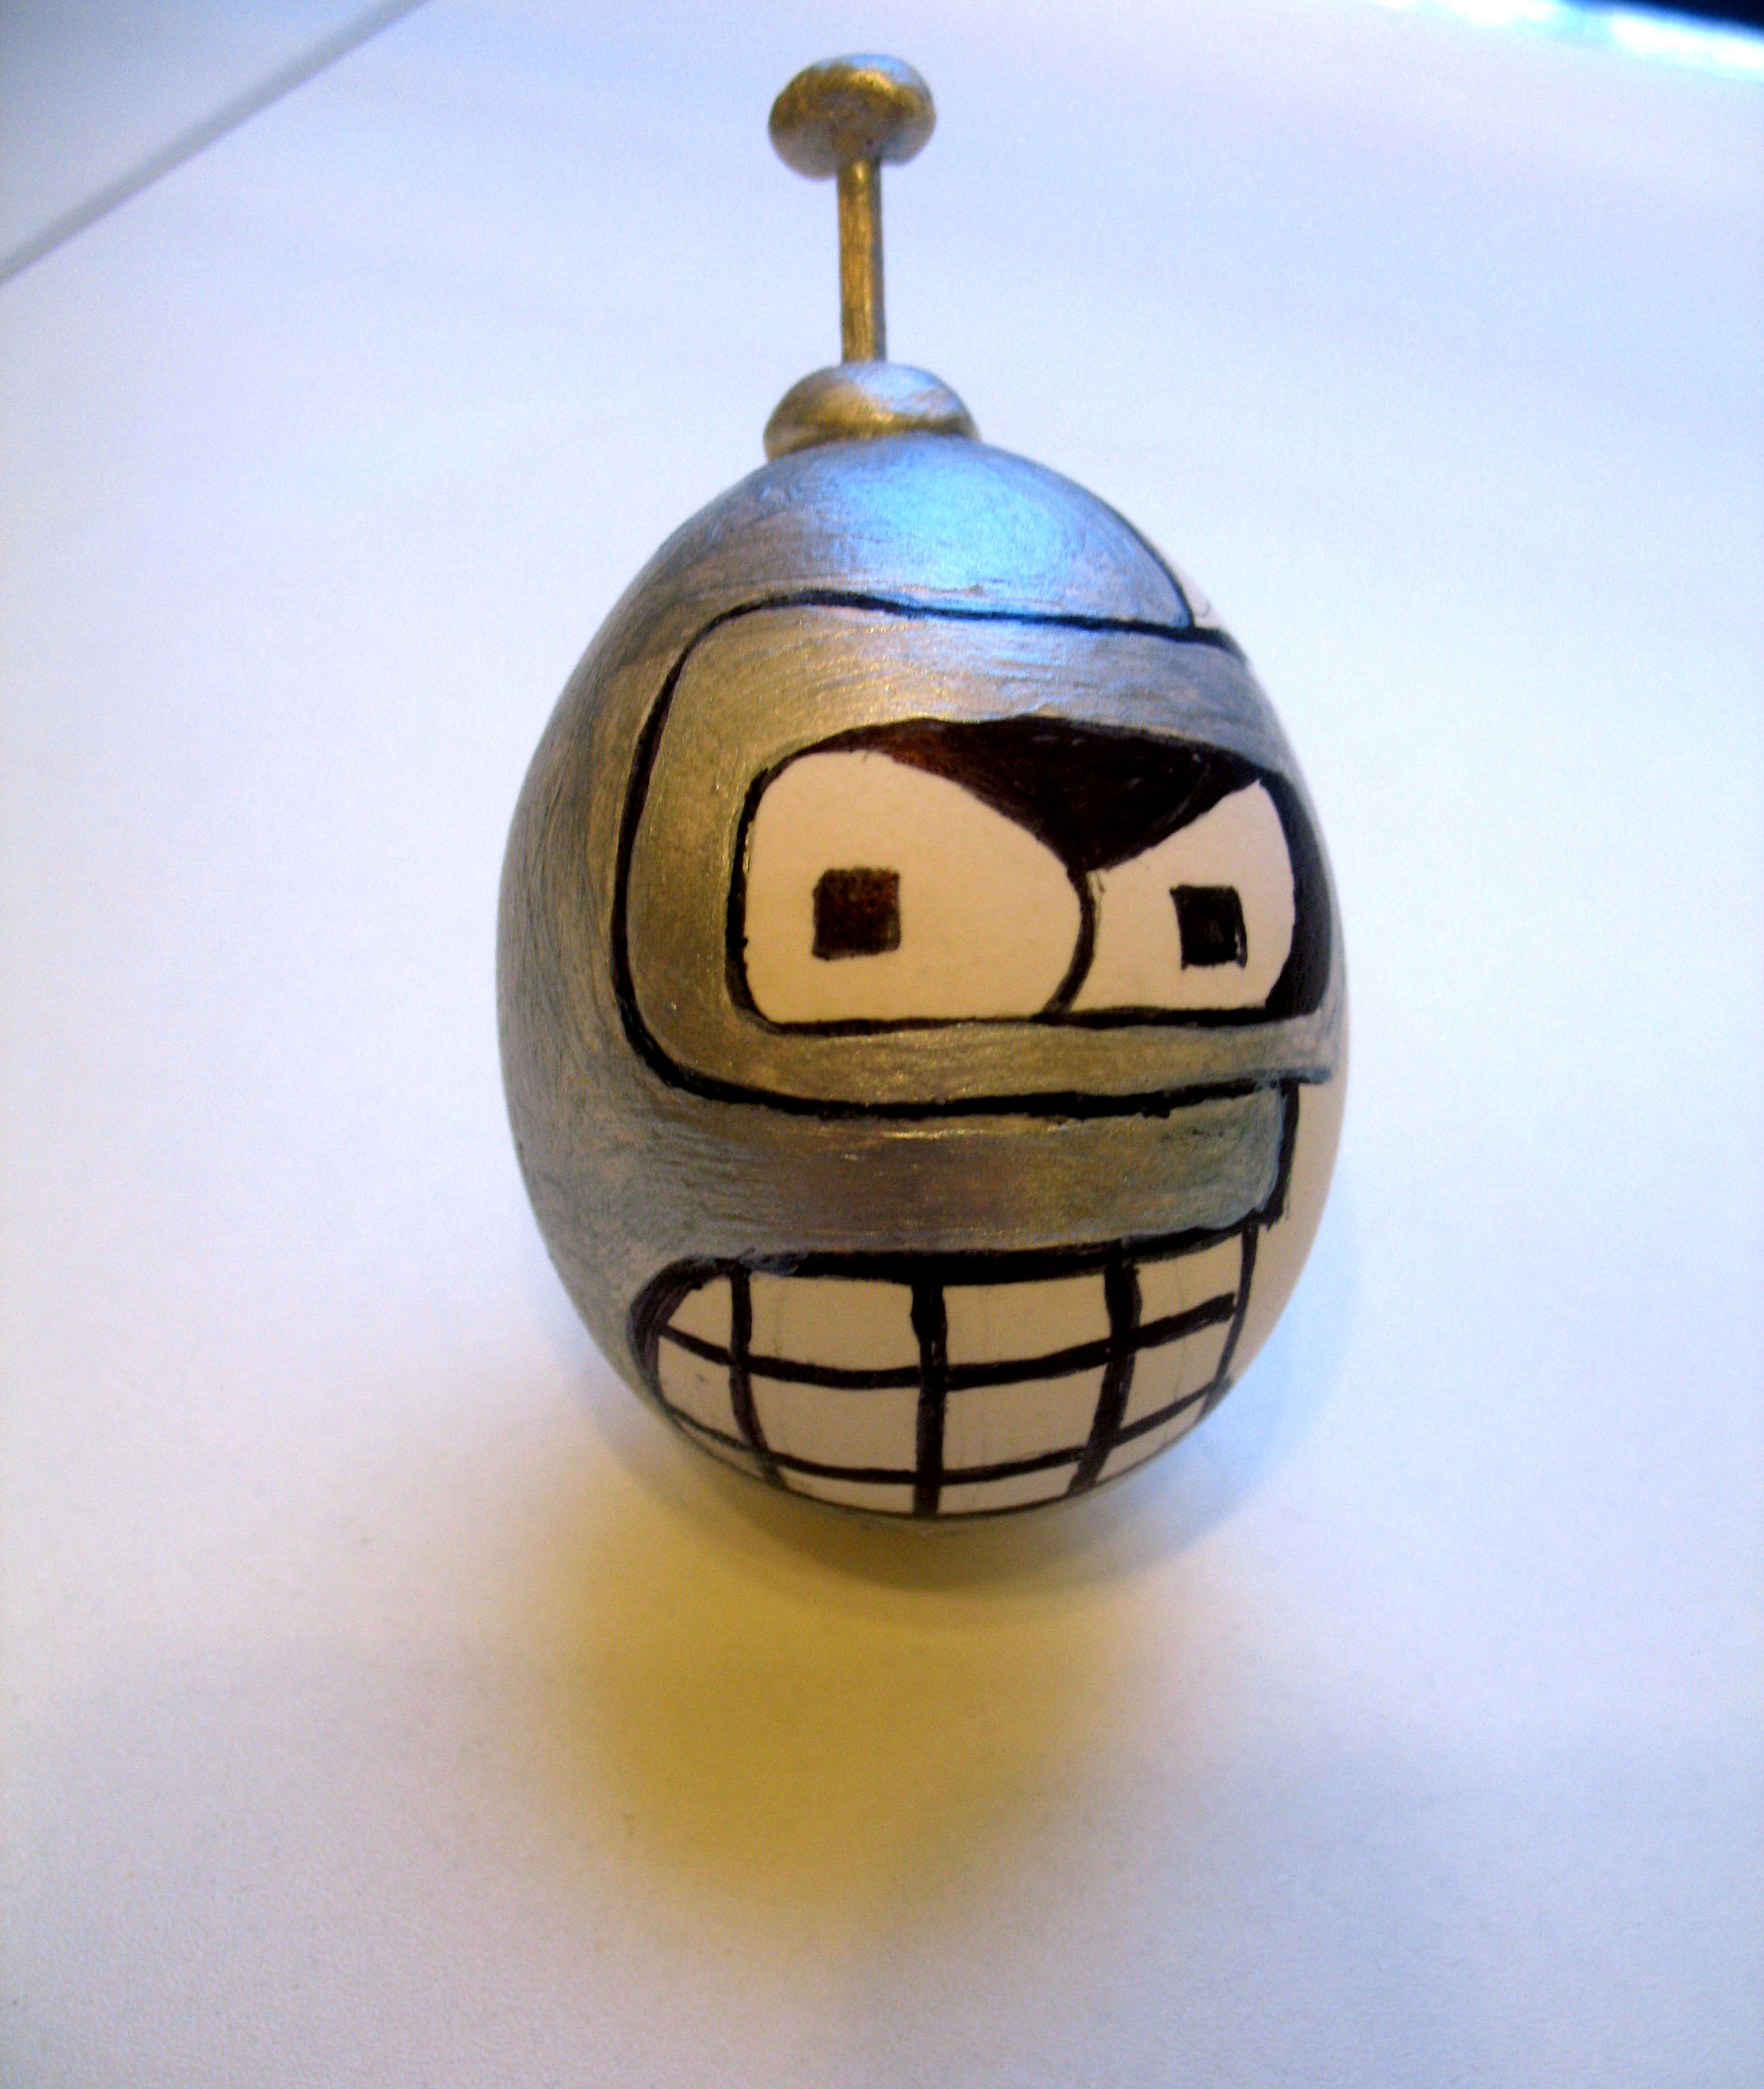 bender egg